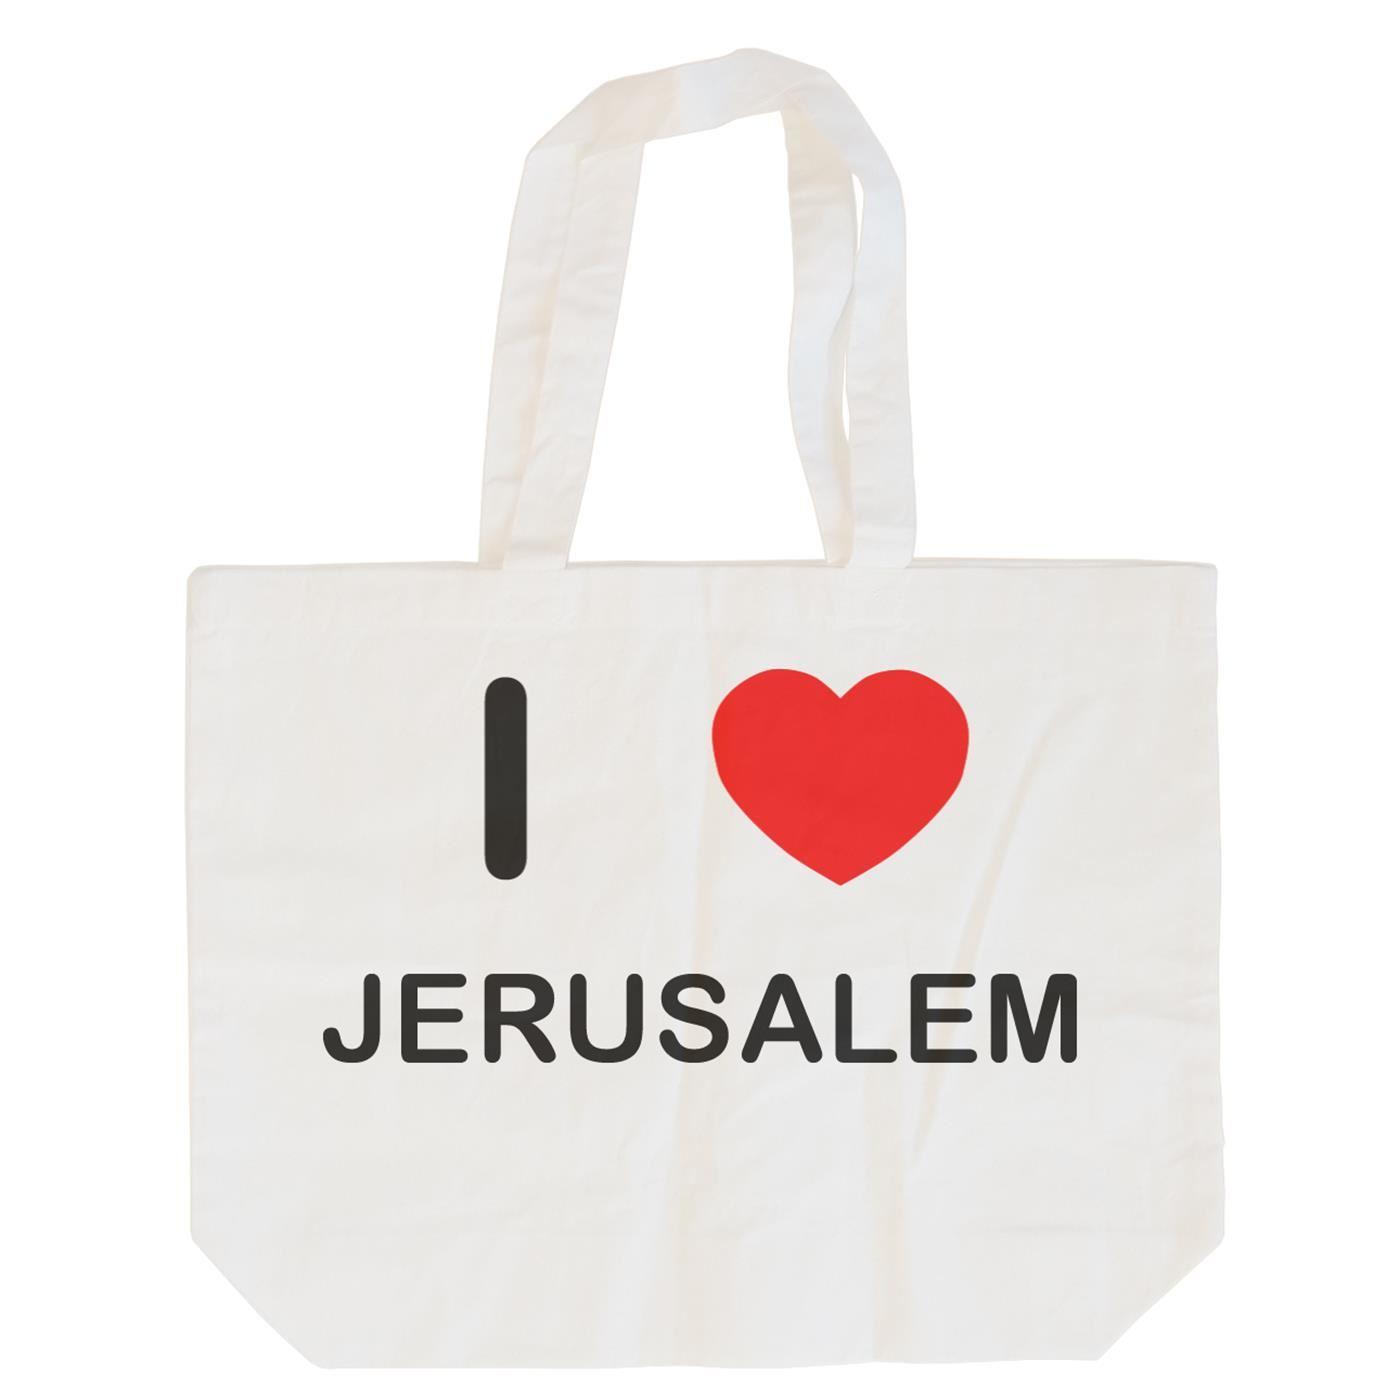 I Love Jerusalem - Cotton Bag | Size choice Tote, Shopper or Sling